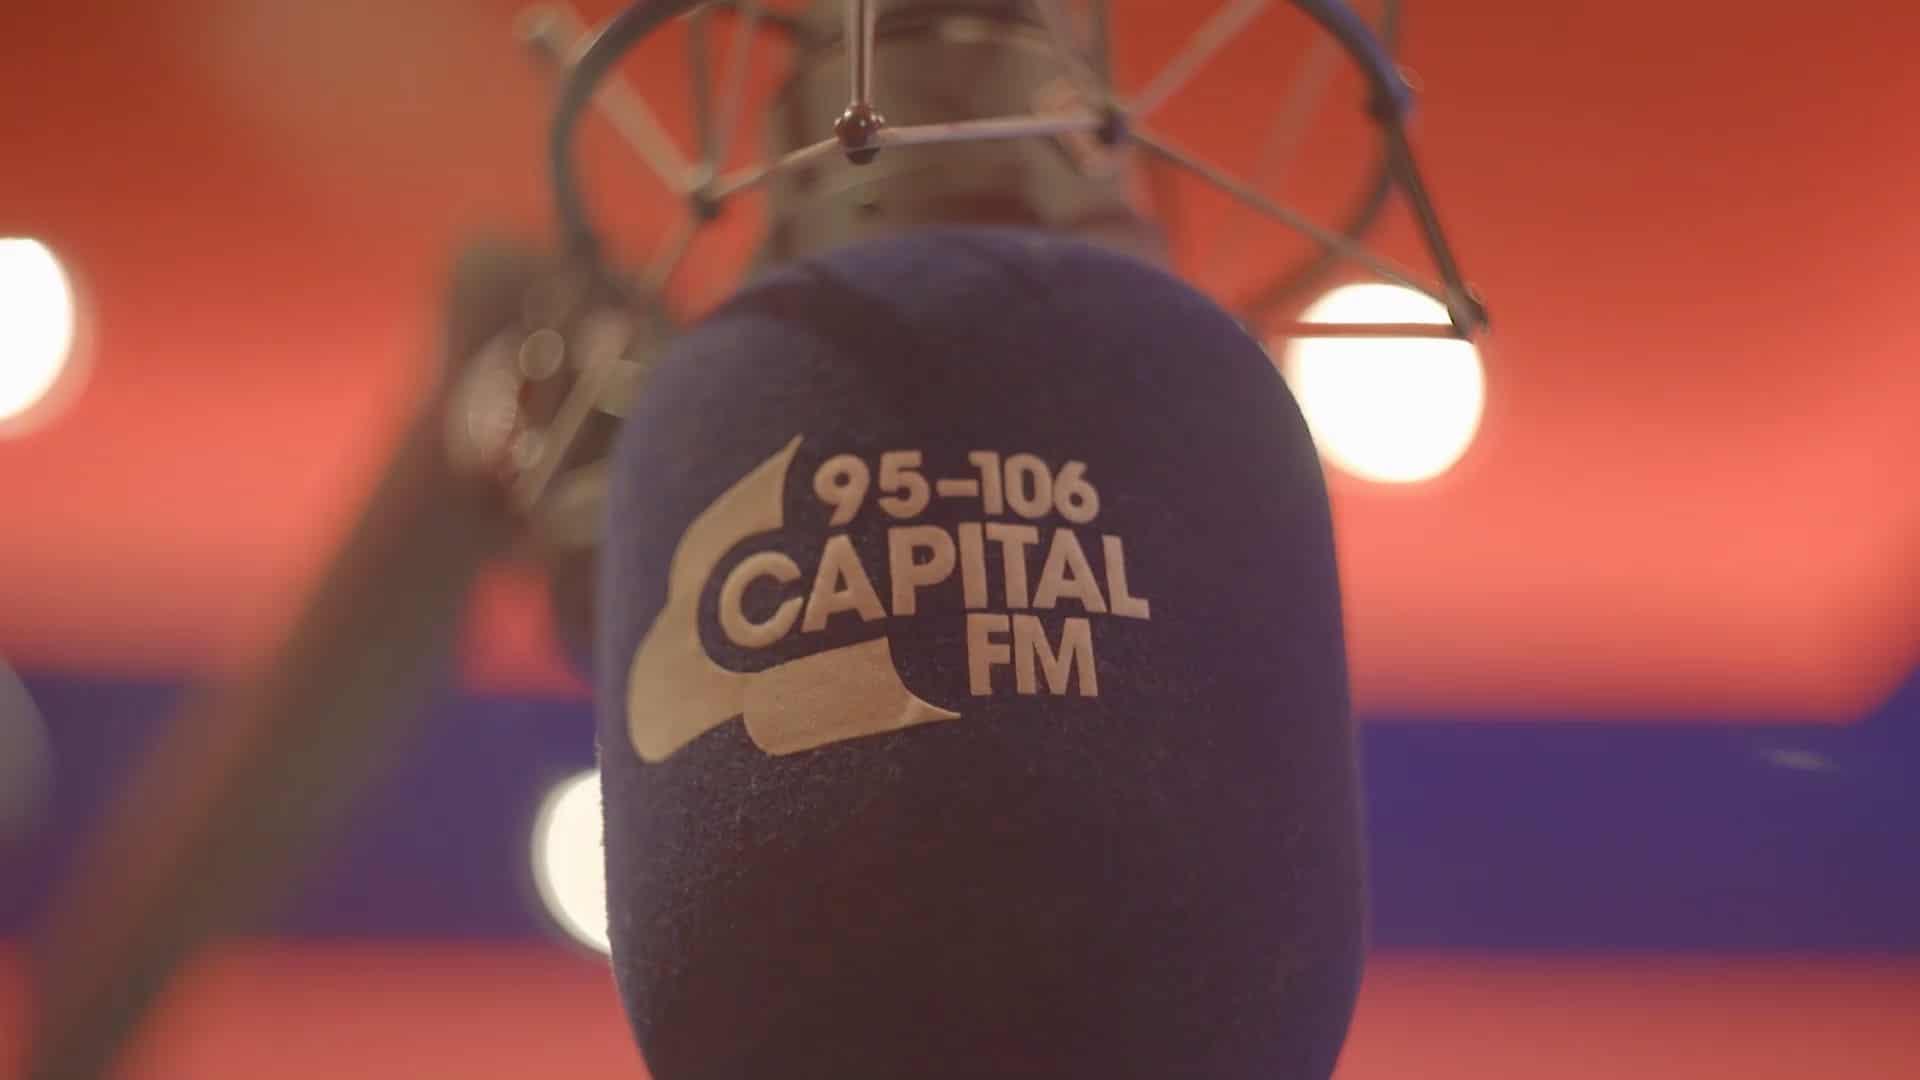 Capital microphone in studio